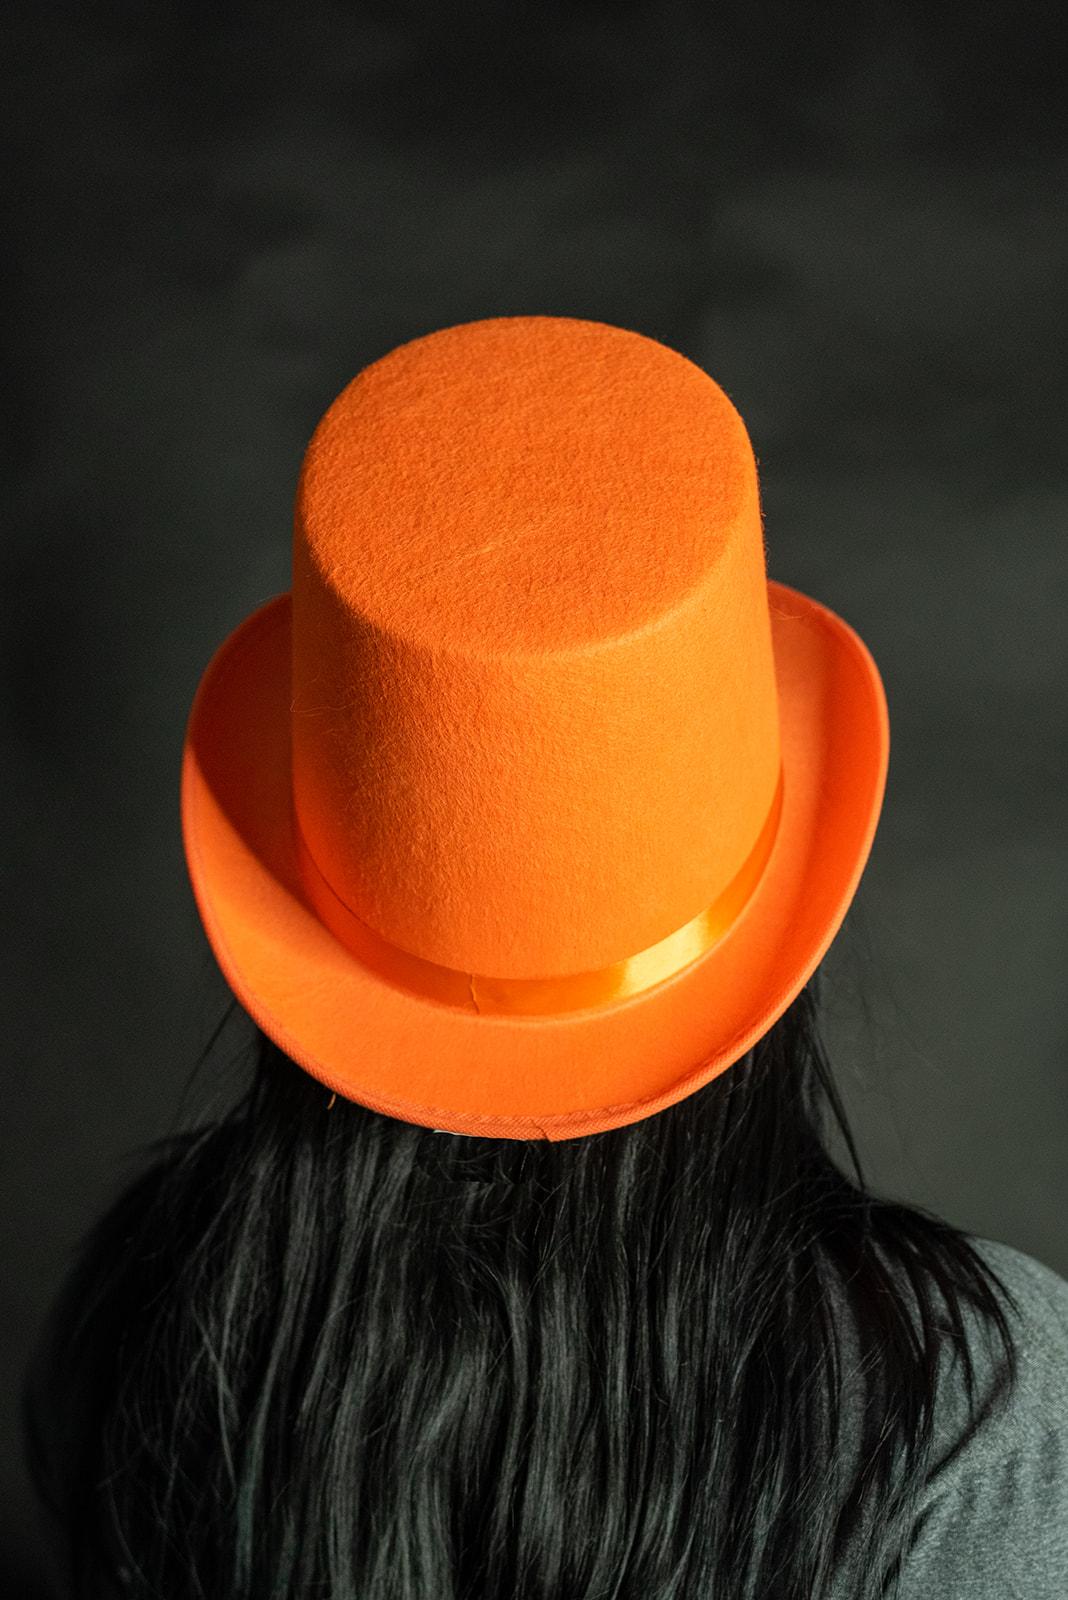 thumbnail 9 - Dumb and Dumber Orange Tall  Felt Top Hat Lloyd Christmas Costume Accessory